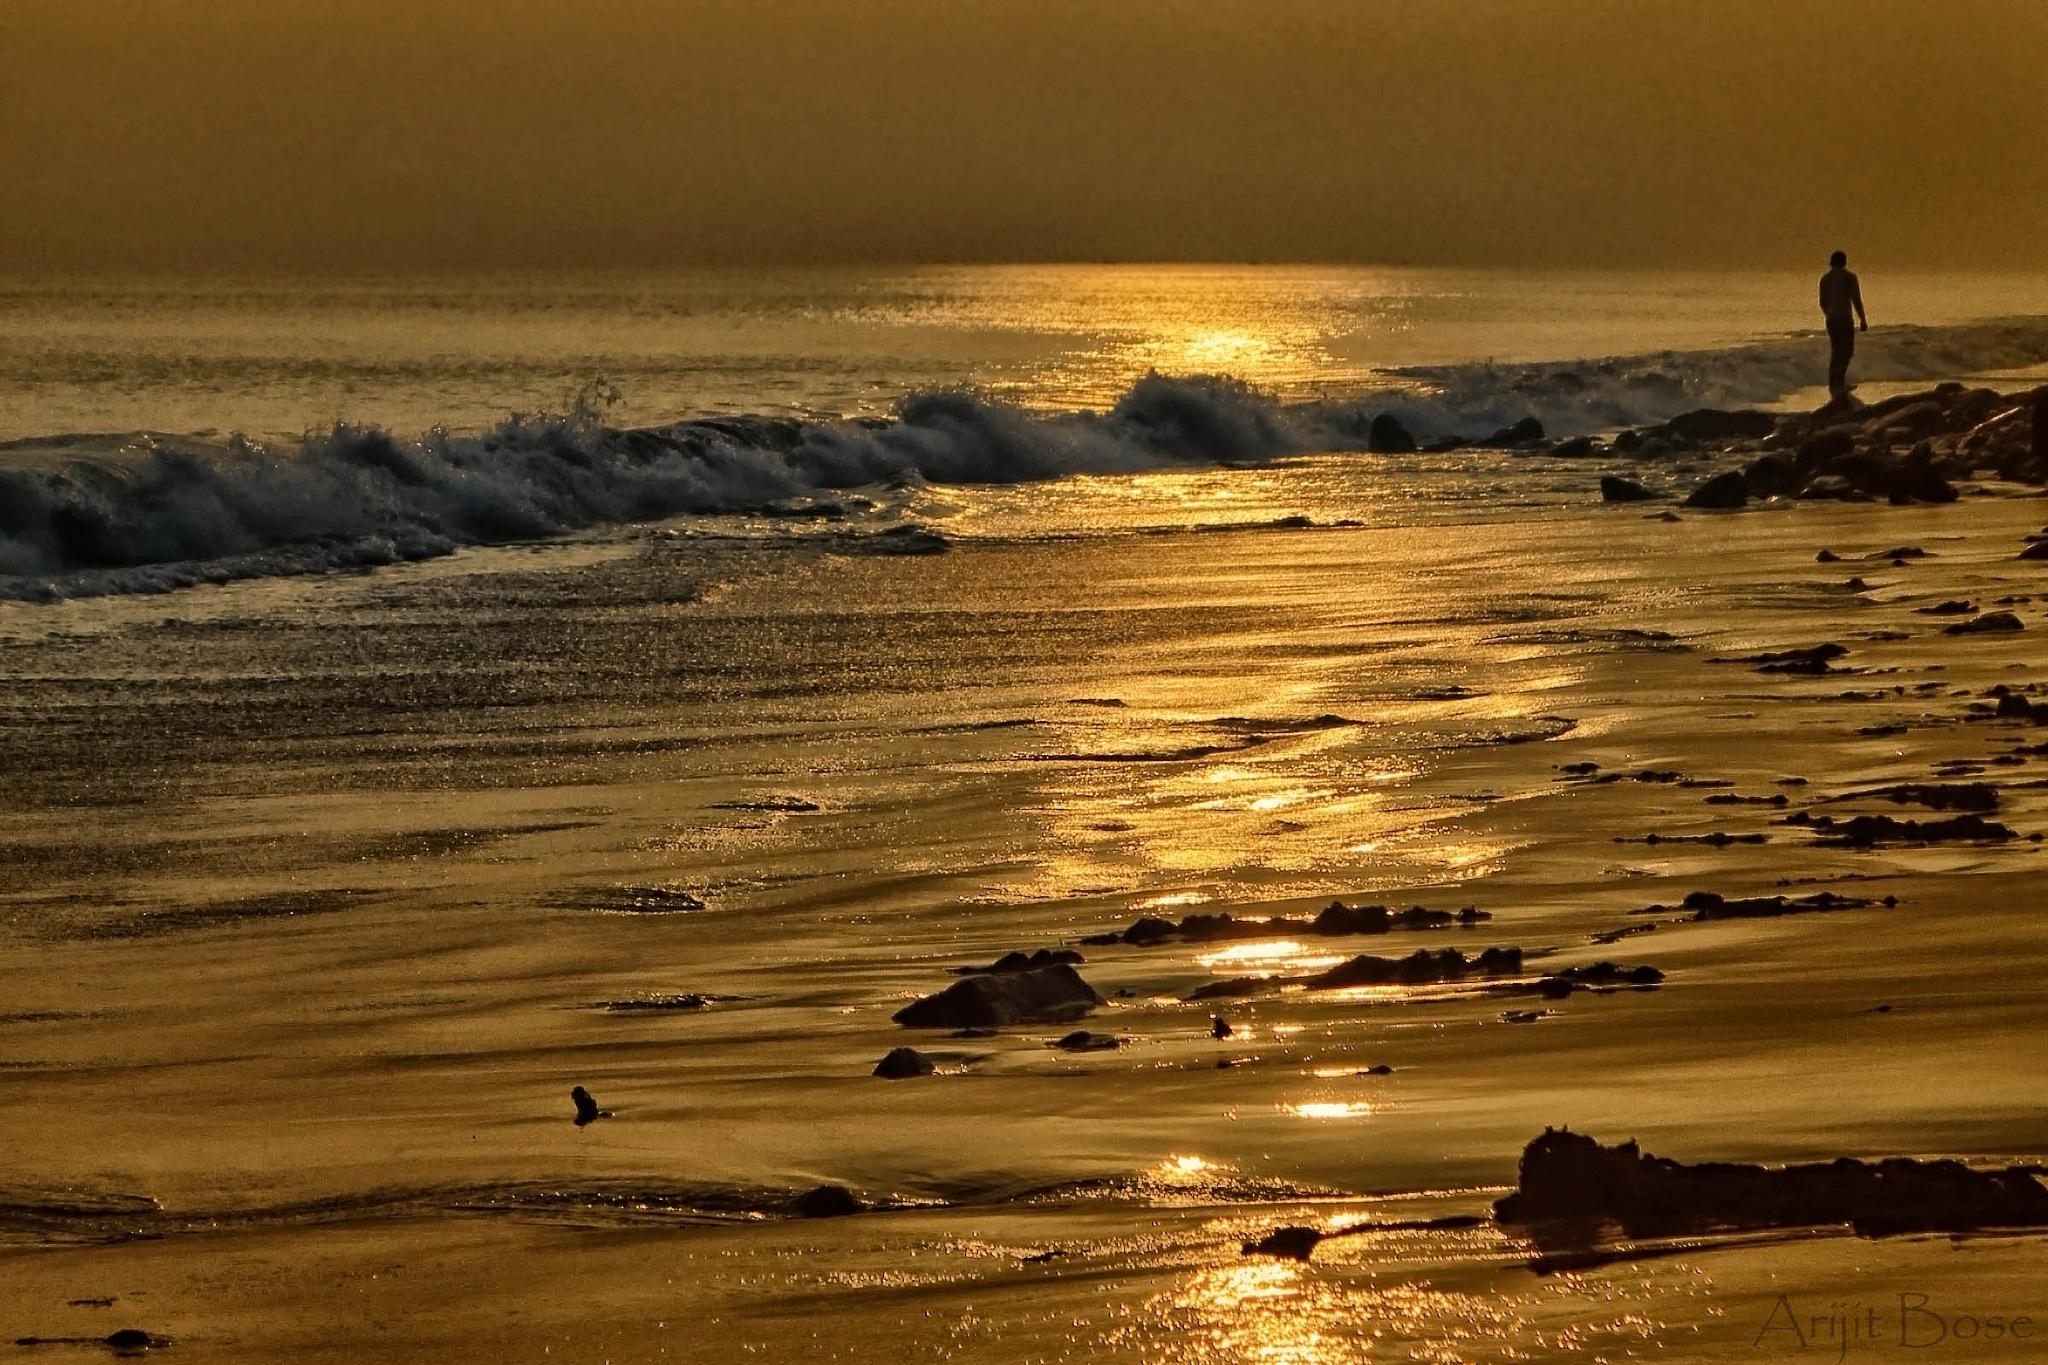 Golden hour. by ArijitBose